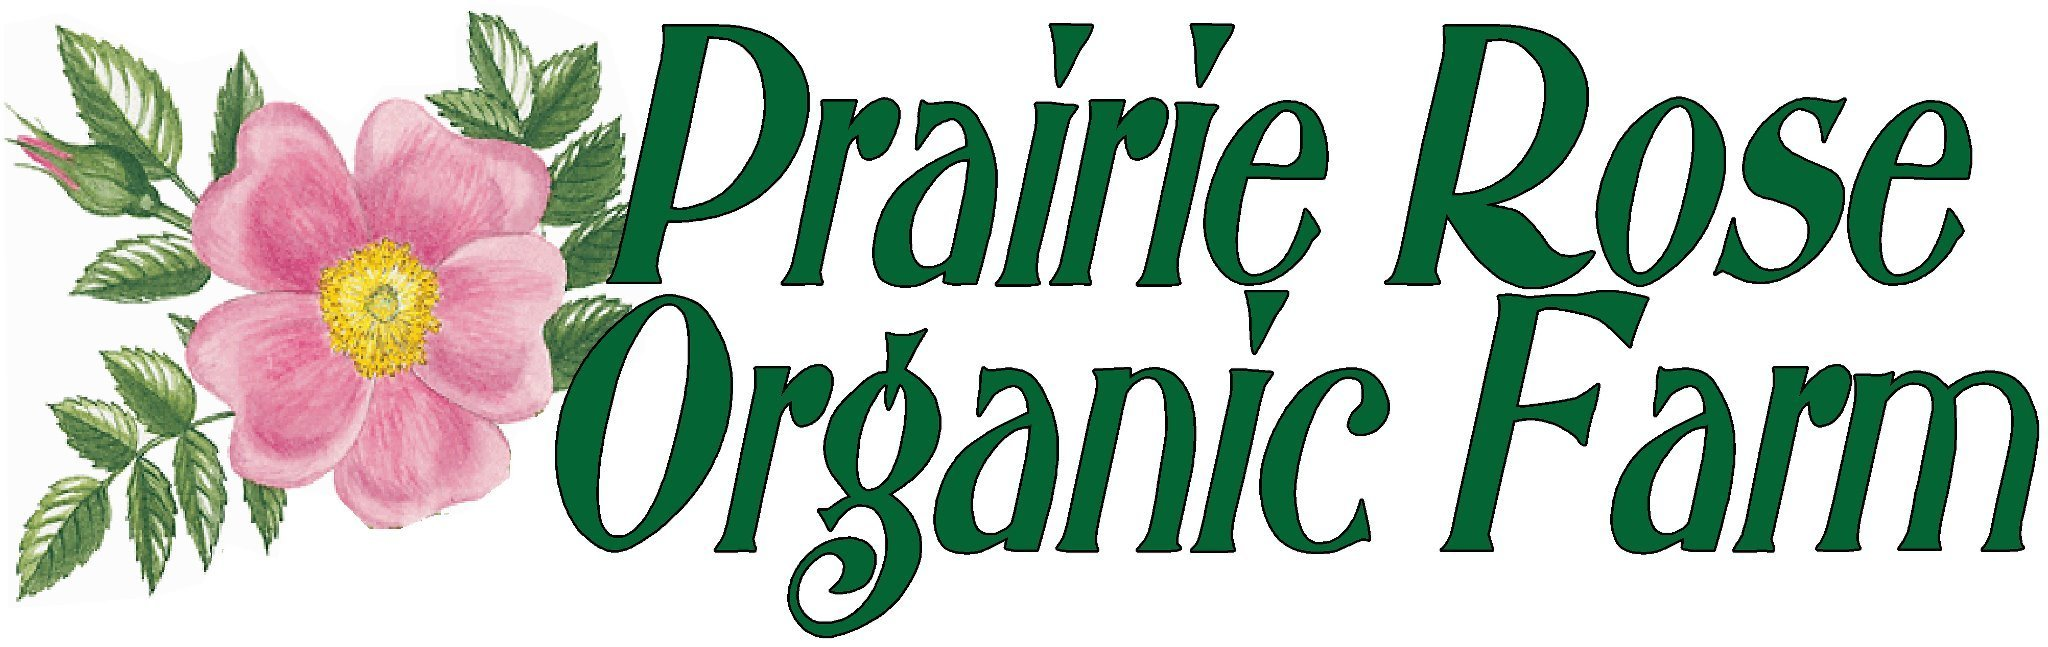 Prairie Rose Organic Side Pork pro10